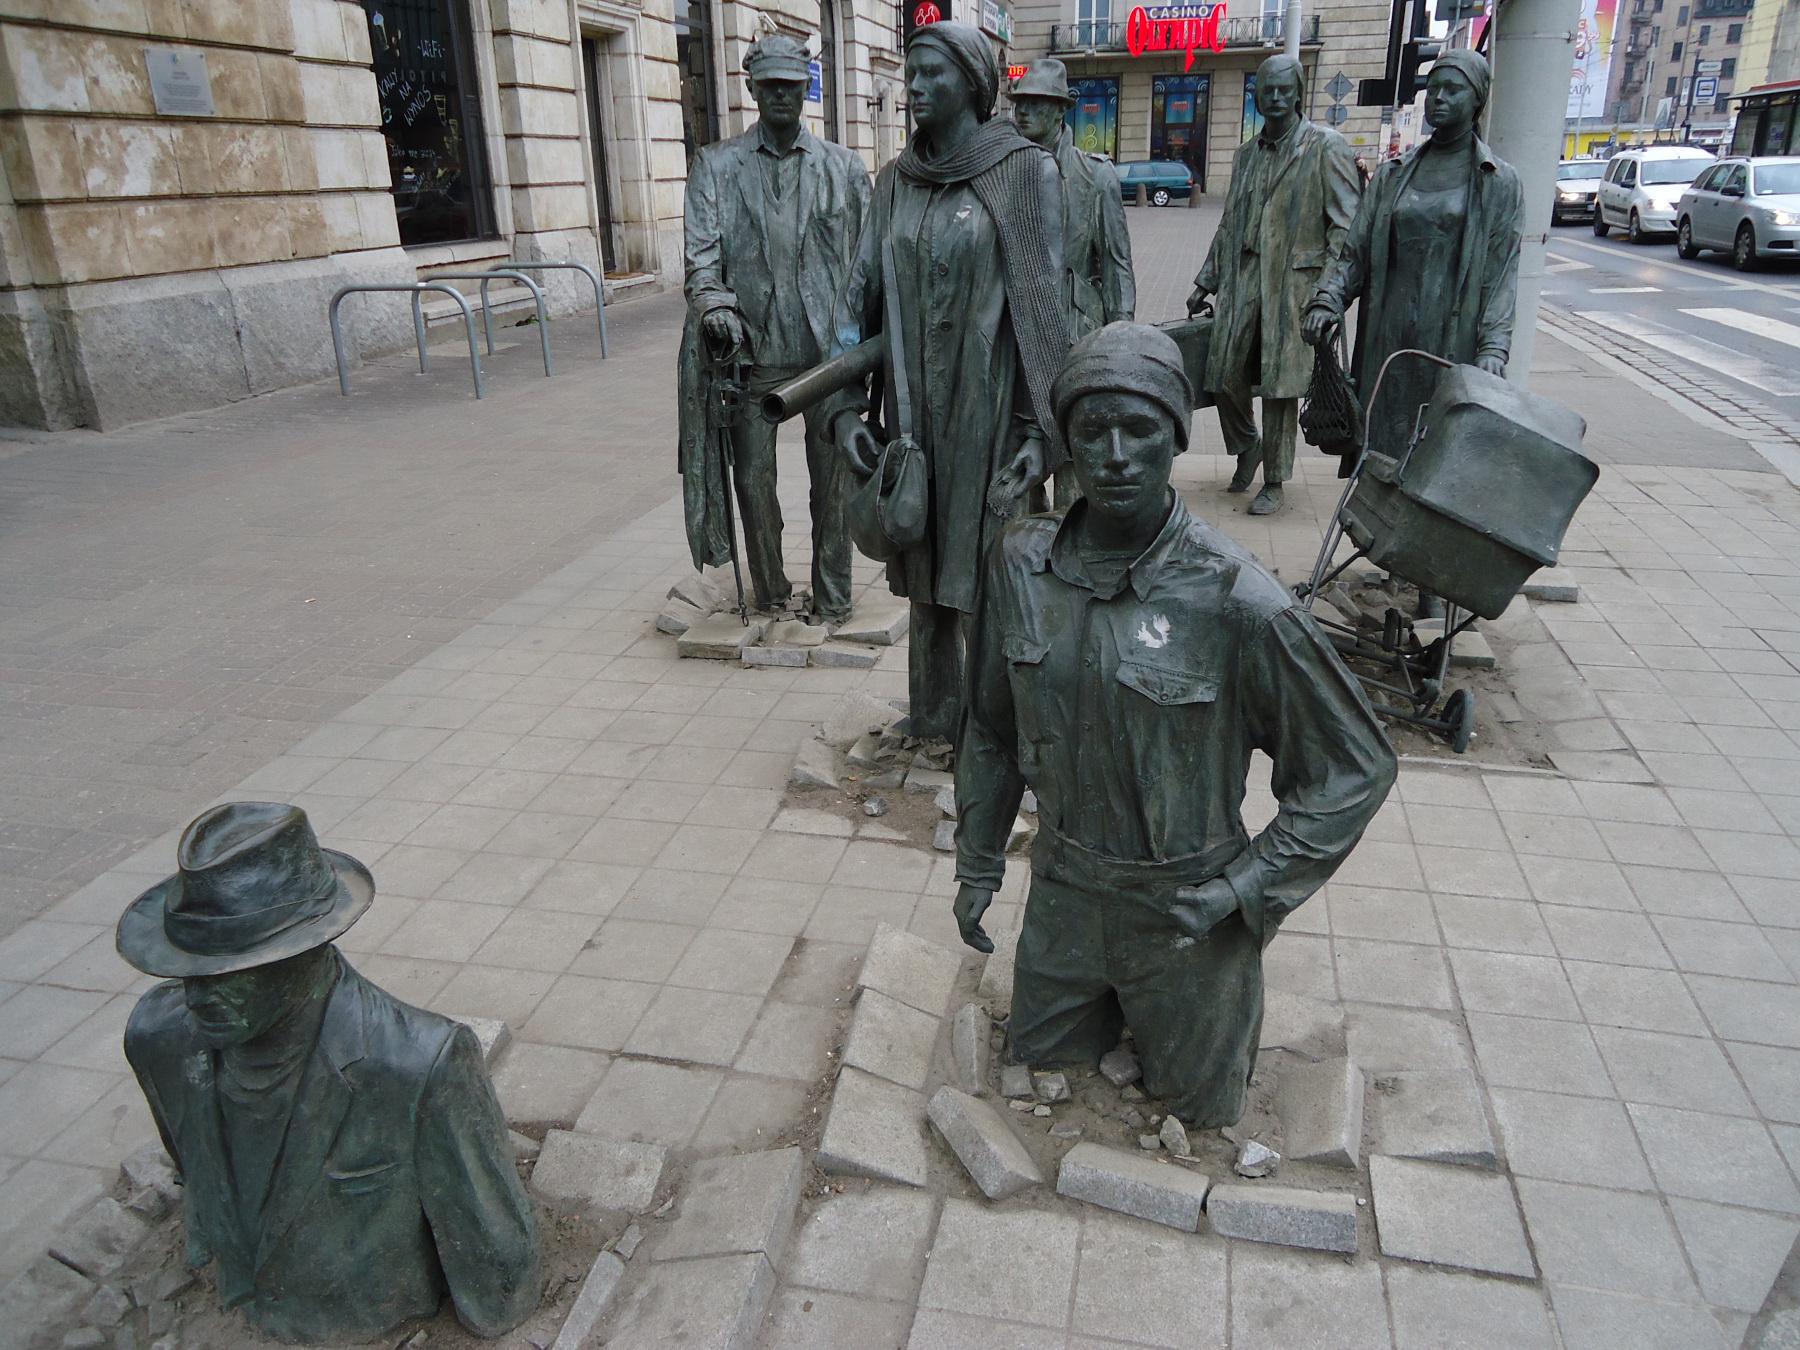 Памятник анонимному прохожему (Pomnik Anonimowego Przechodnia)